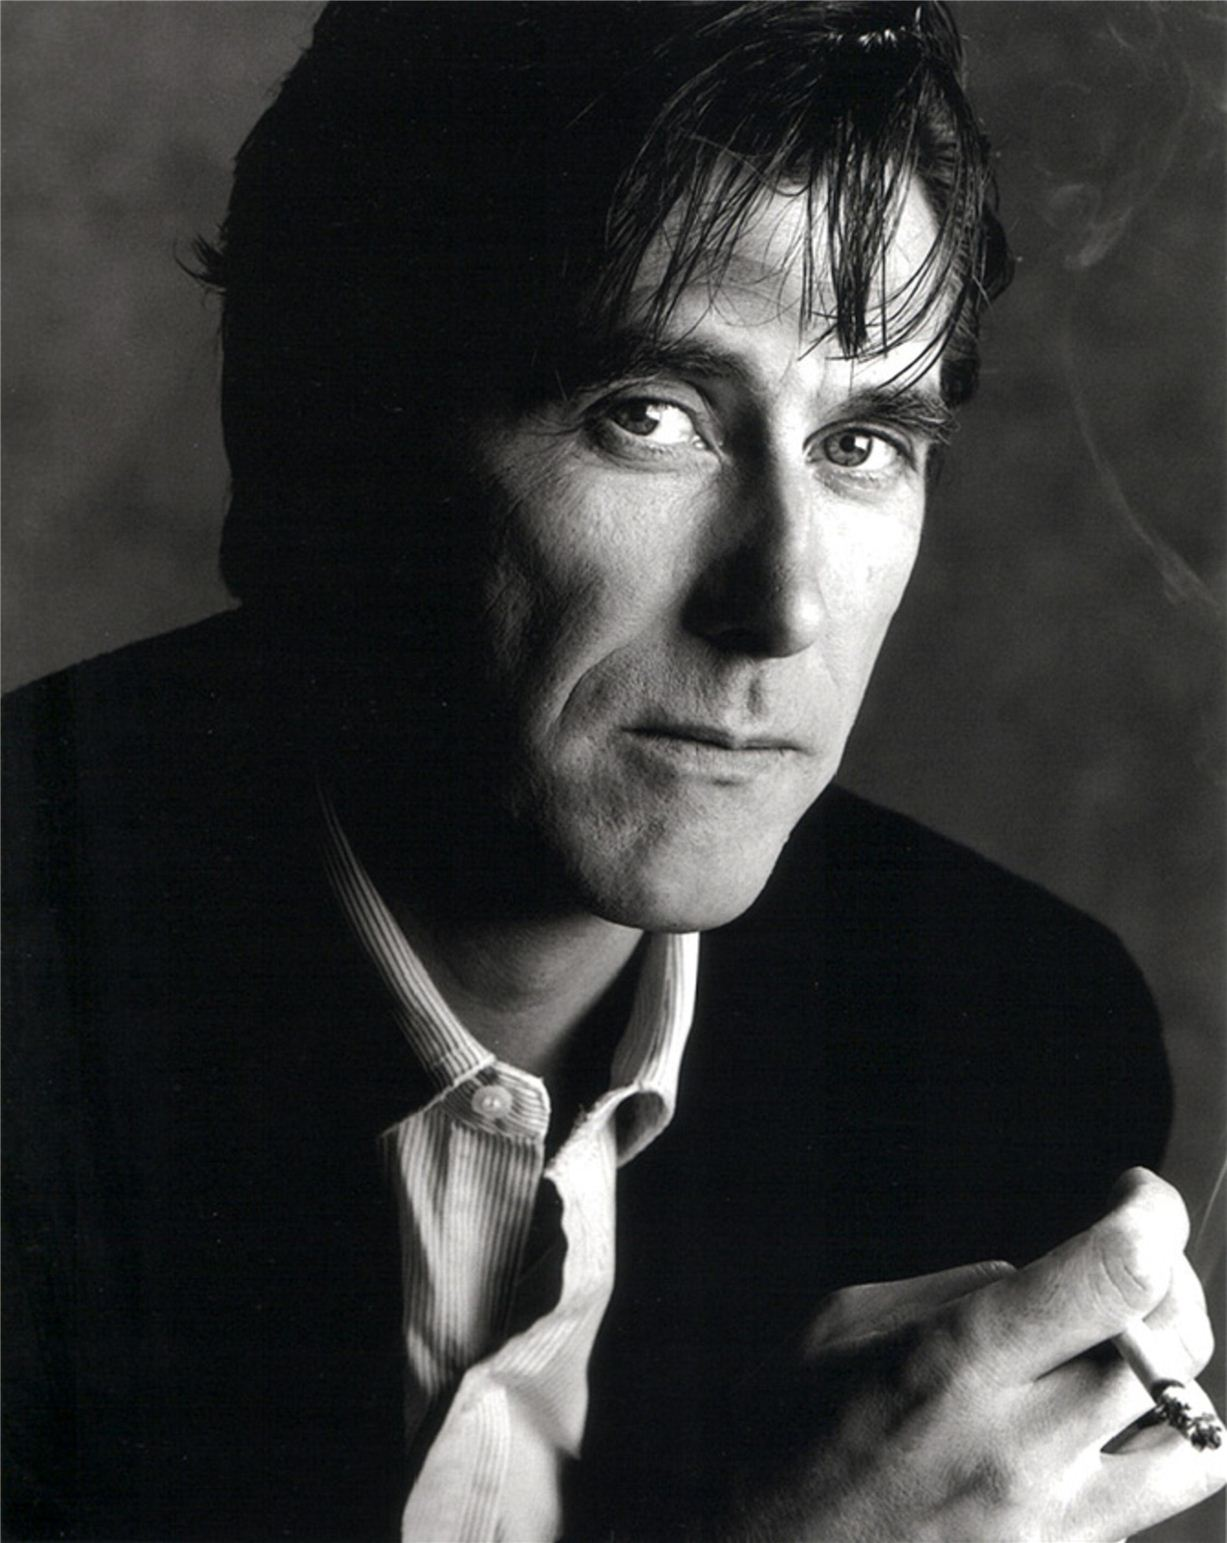 Bryan Ferry / Брайан Ферри - портрет фотографа Грега Гормана / Greg Gorman